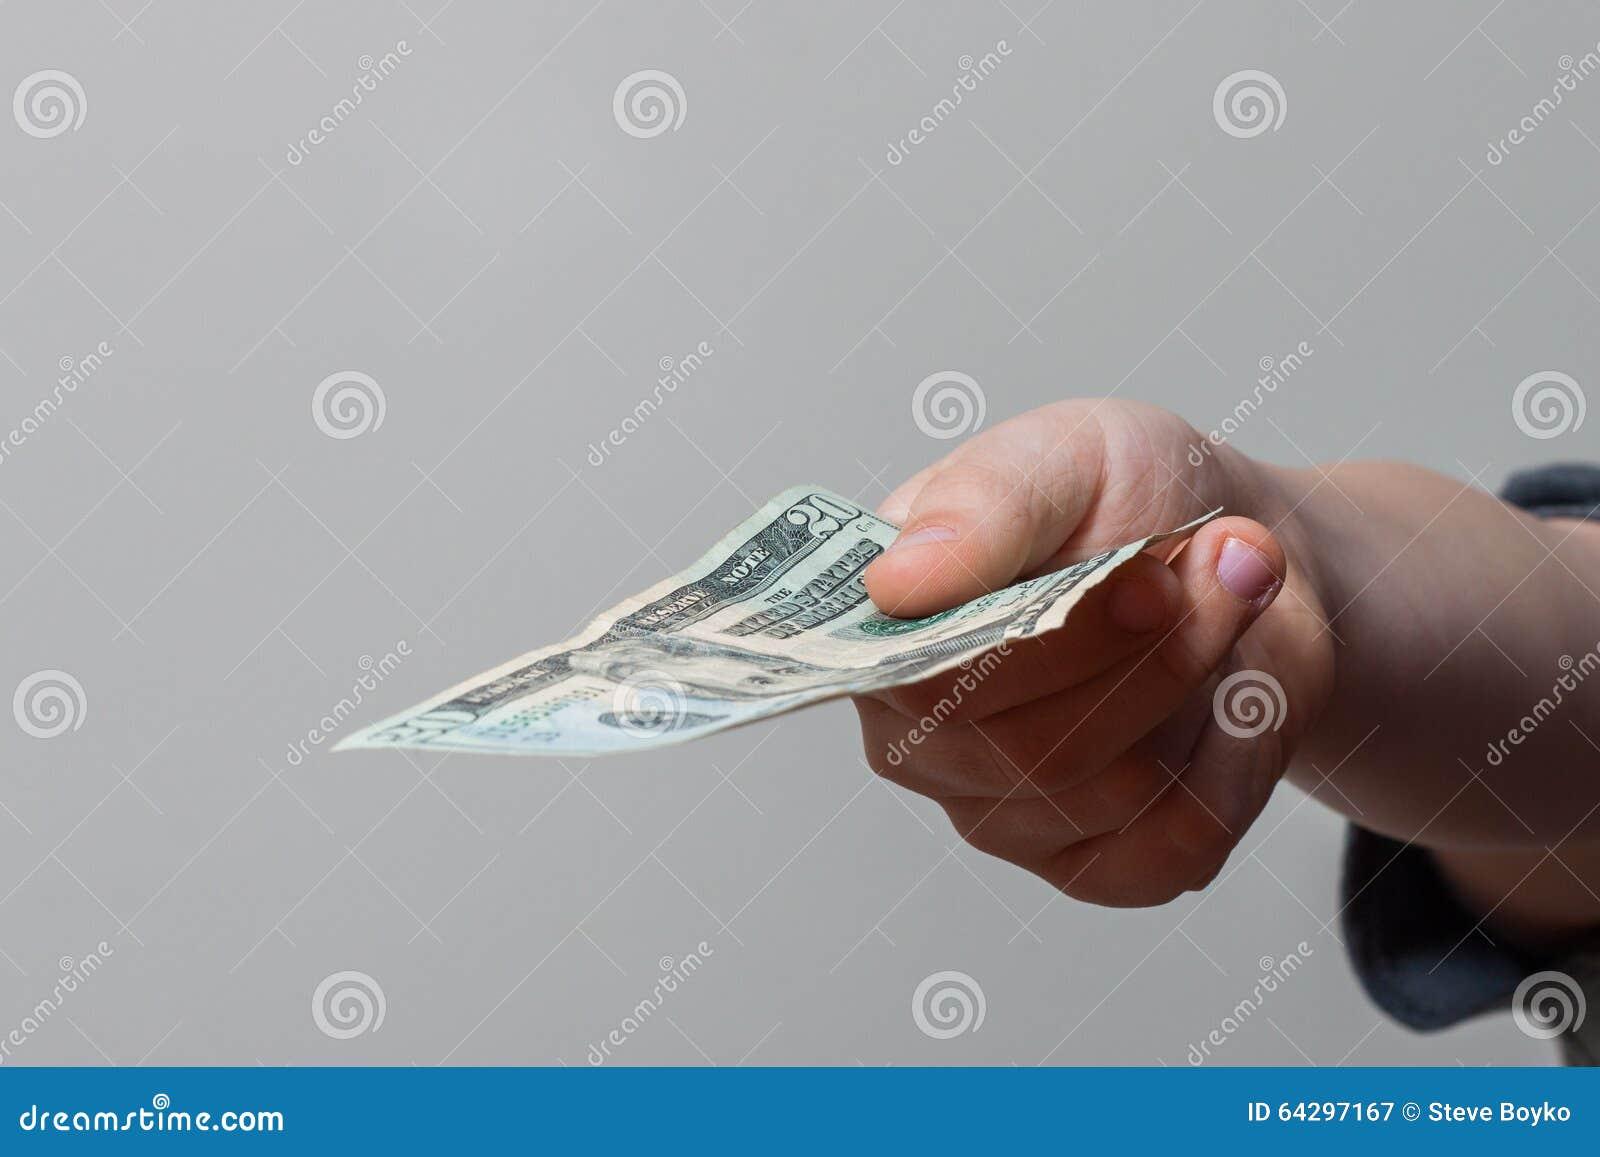 Child Giving Money